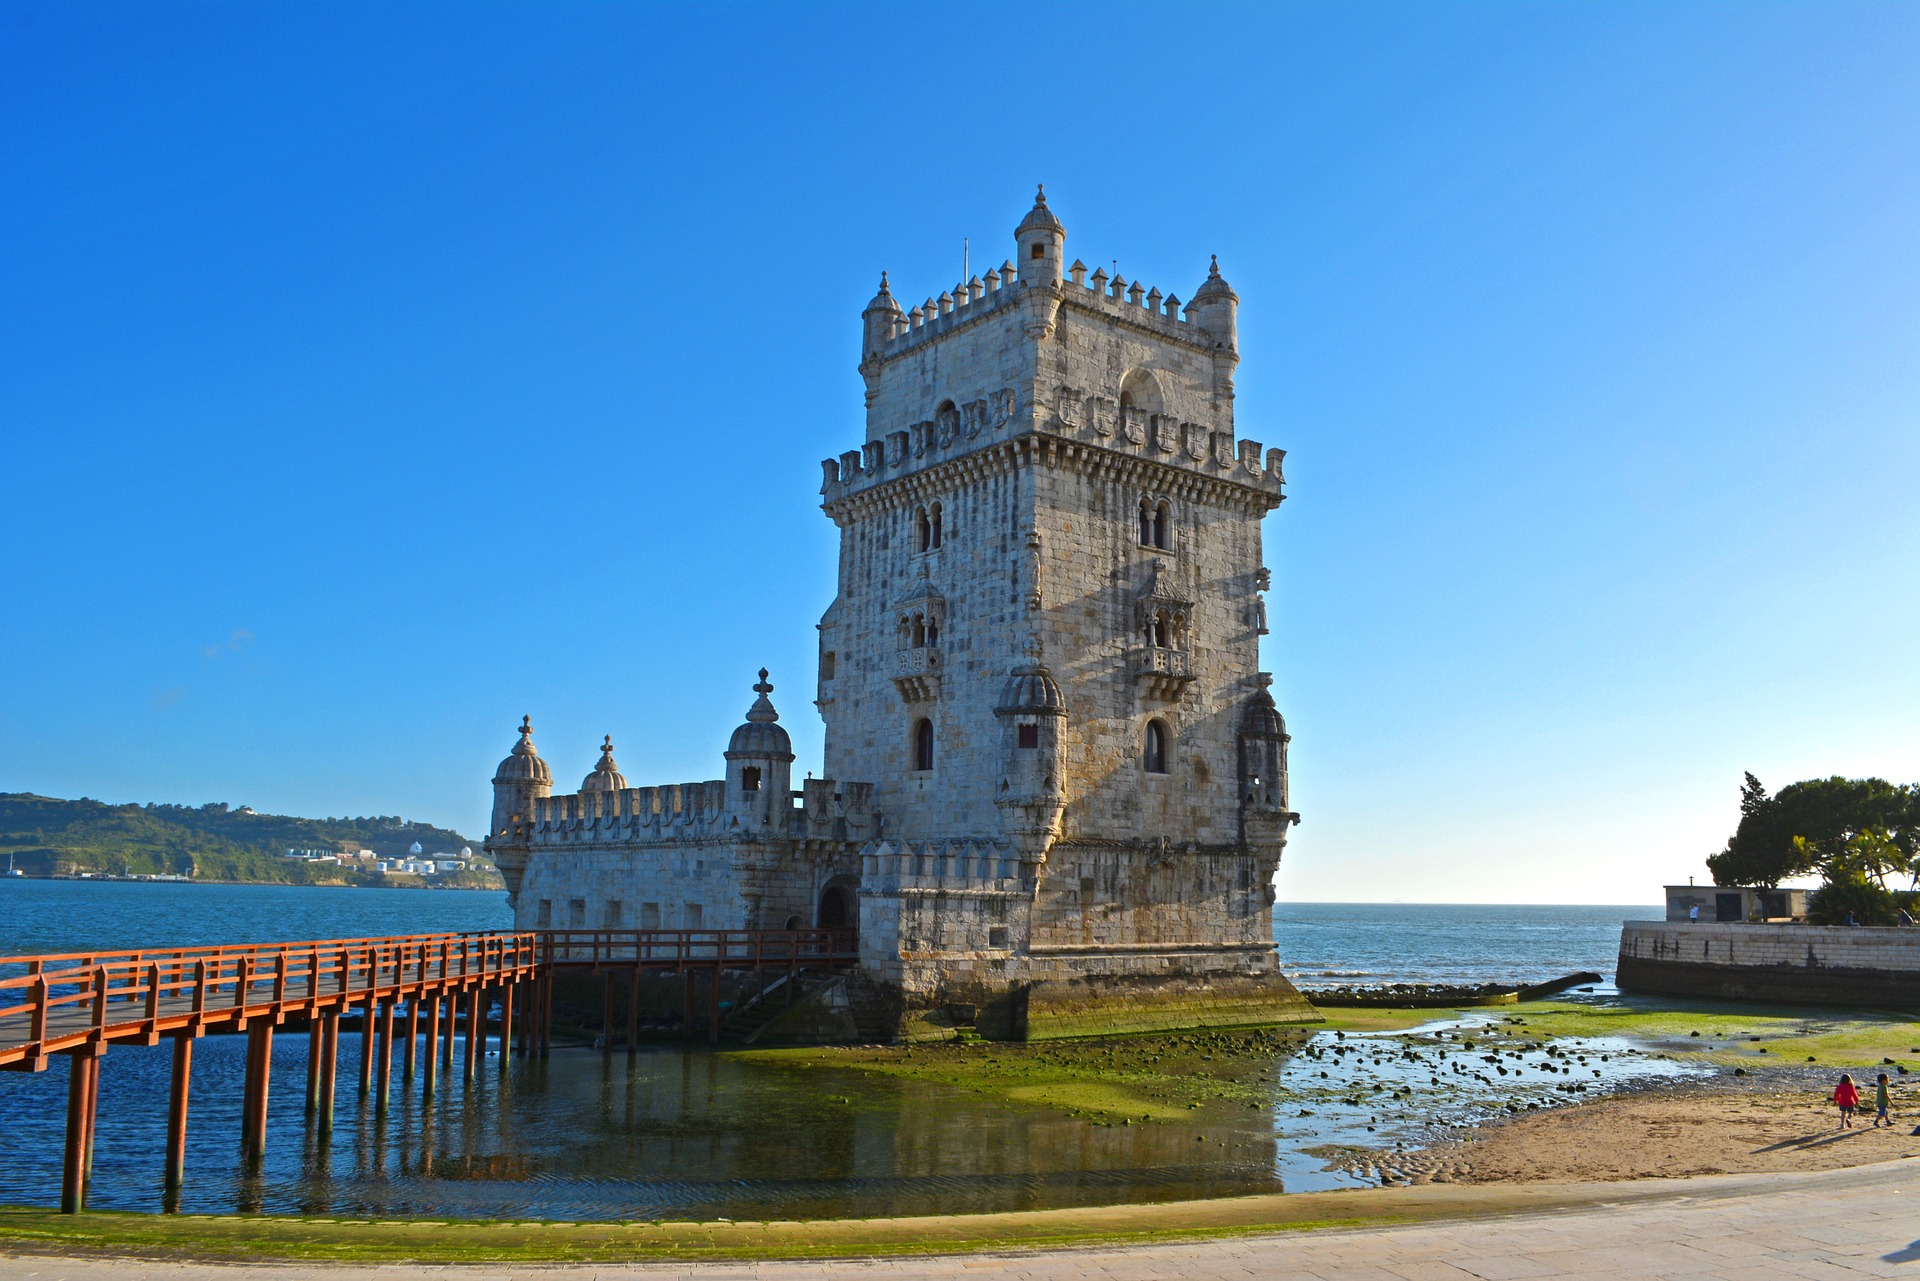 Berühmte Behlen Turm von Lissabon